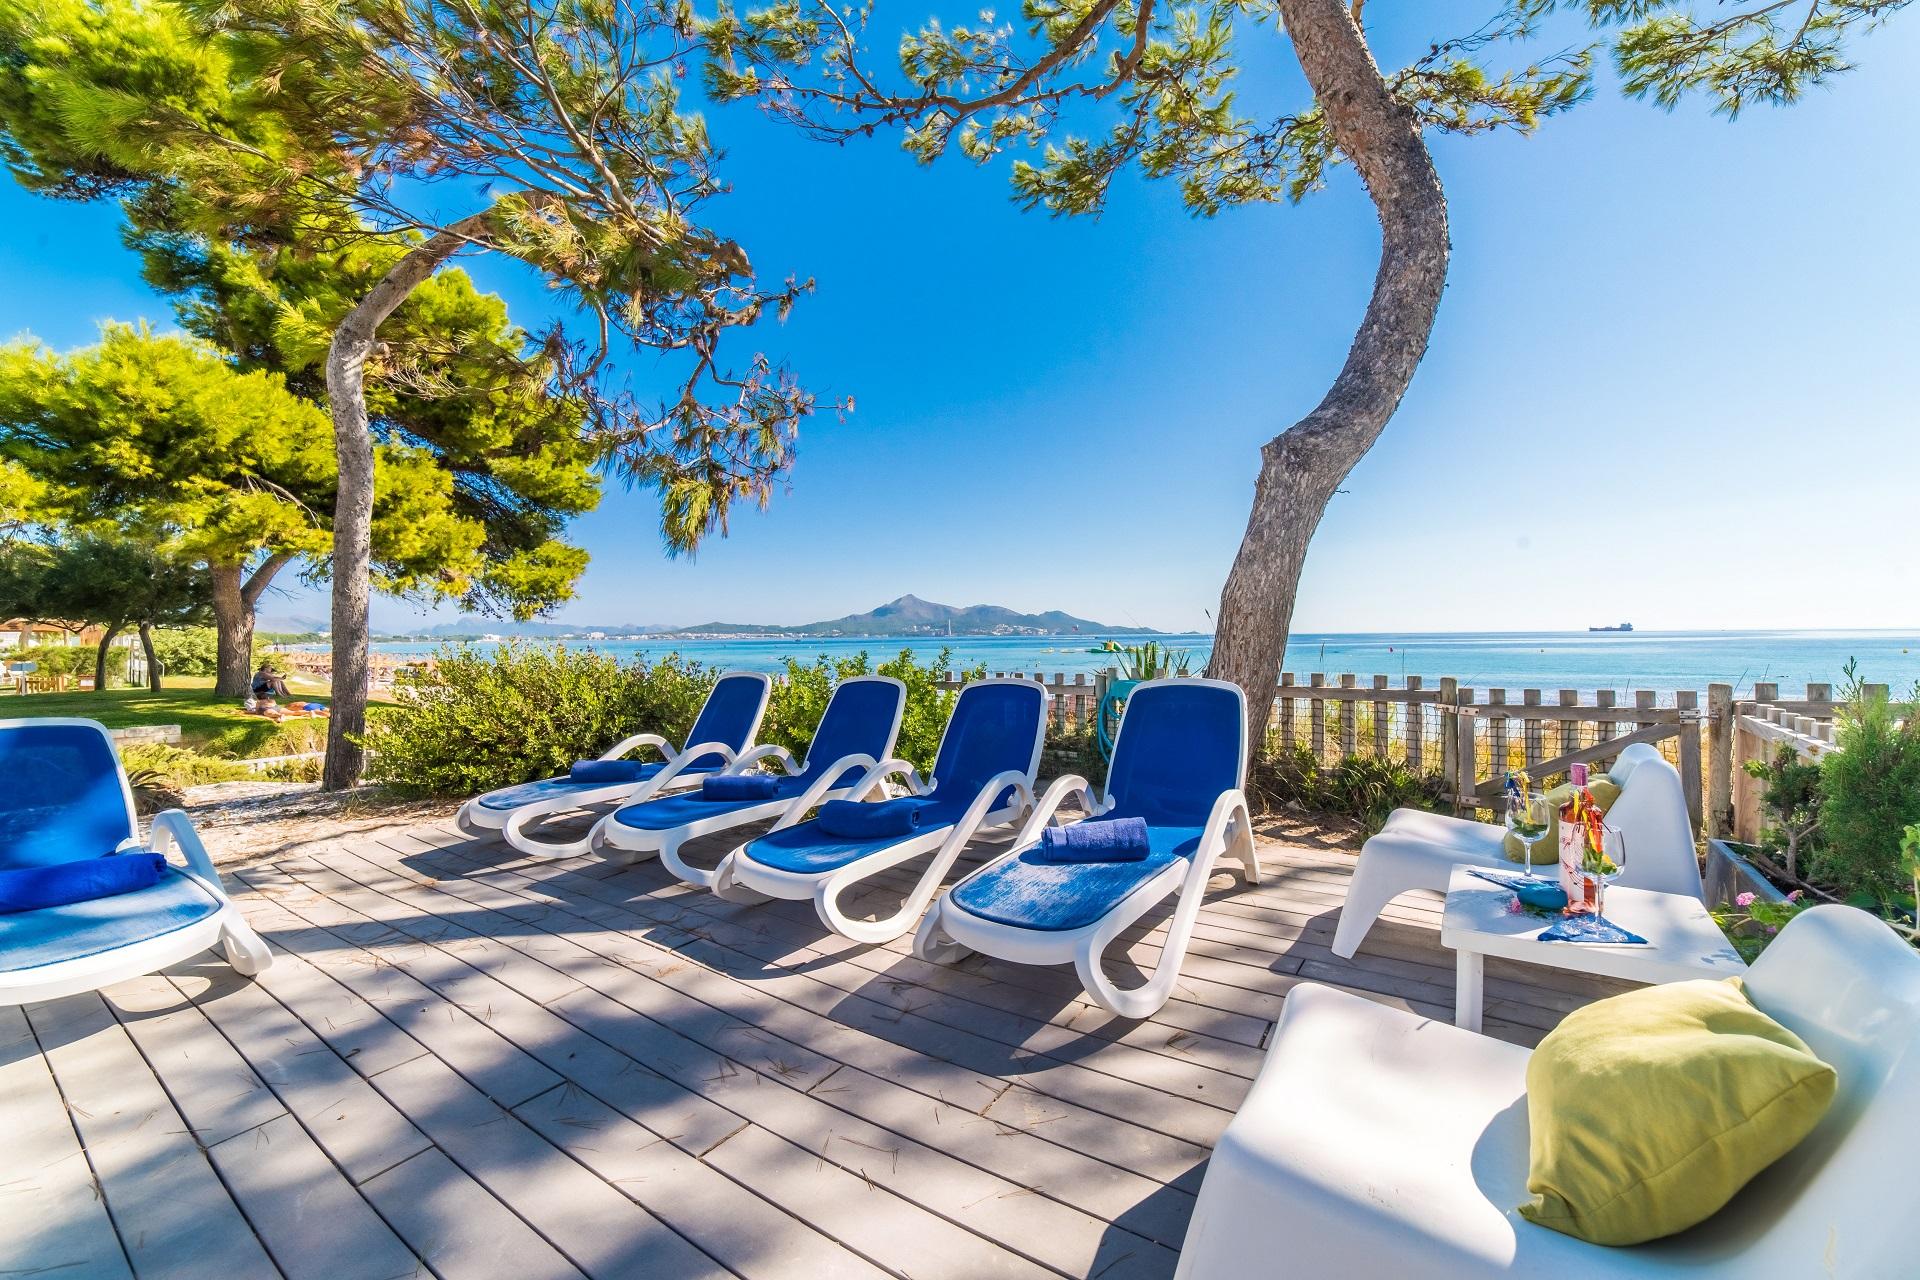 Ferienhaus direkt am strand und meer am playa de muro for Design hotel mallorca strand